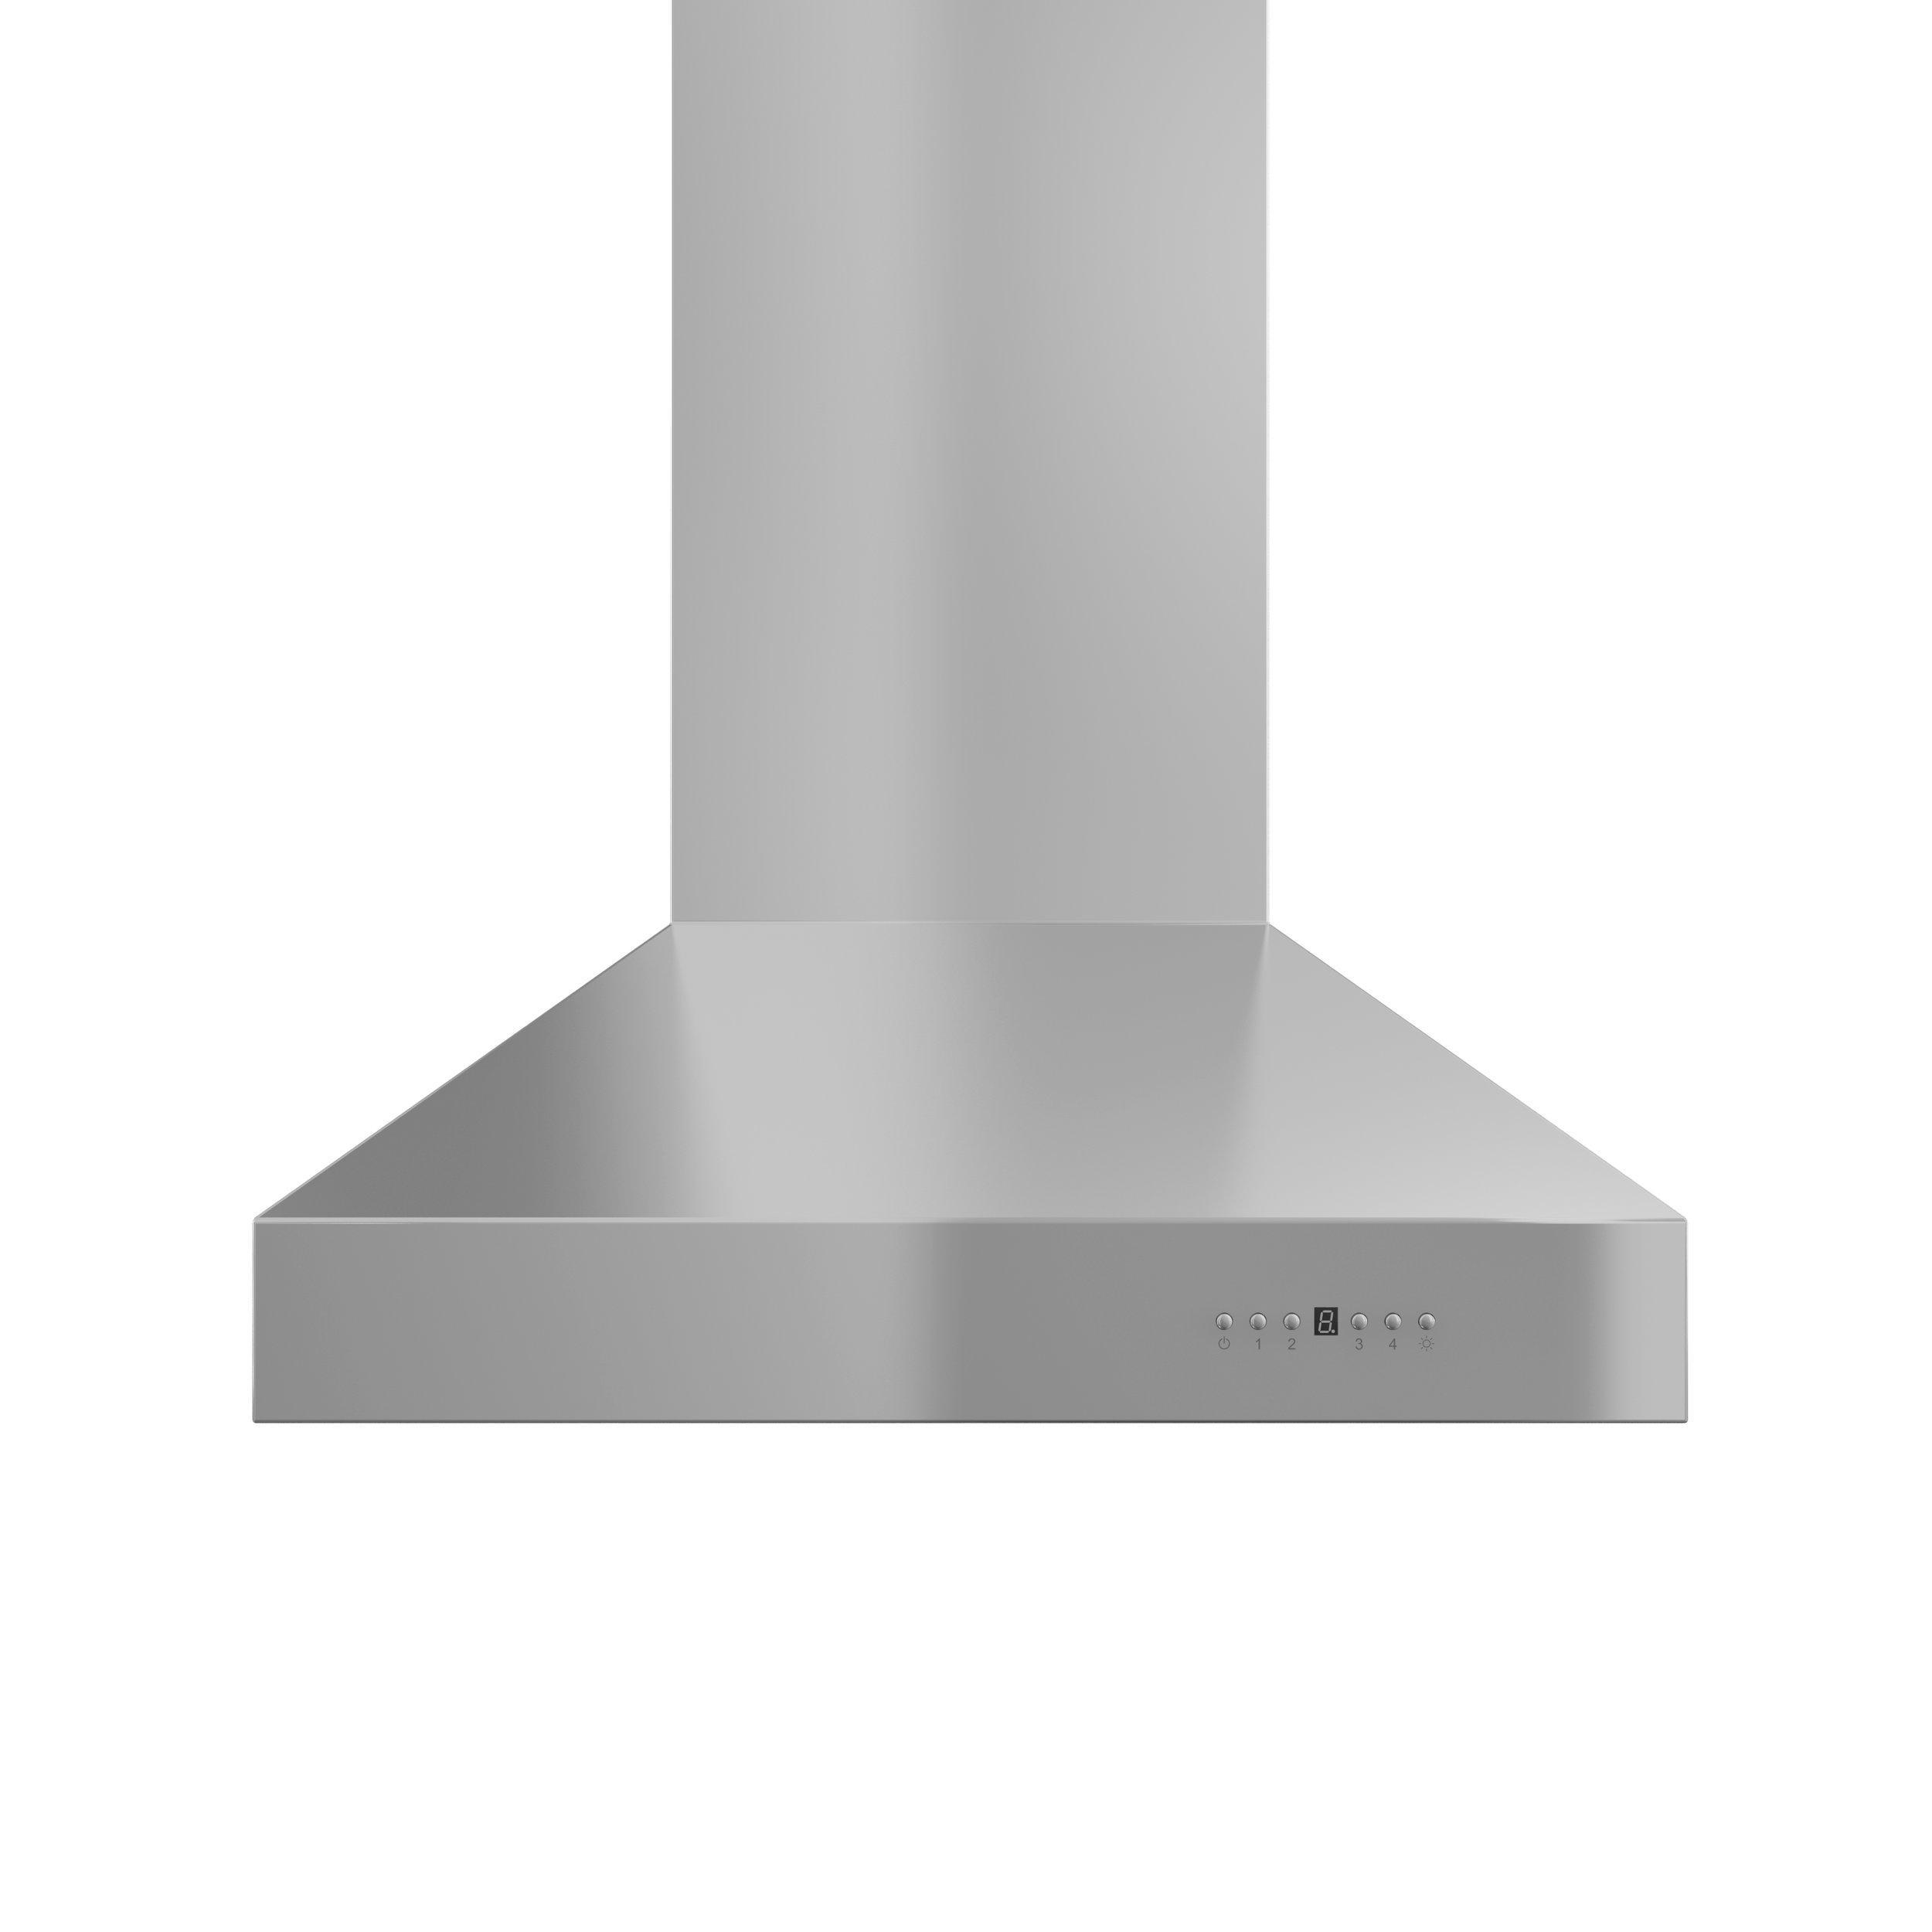 zline-stainless-steel-wall-mounted-range-hood-697-front.jpg